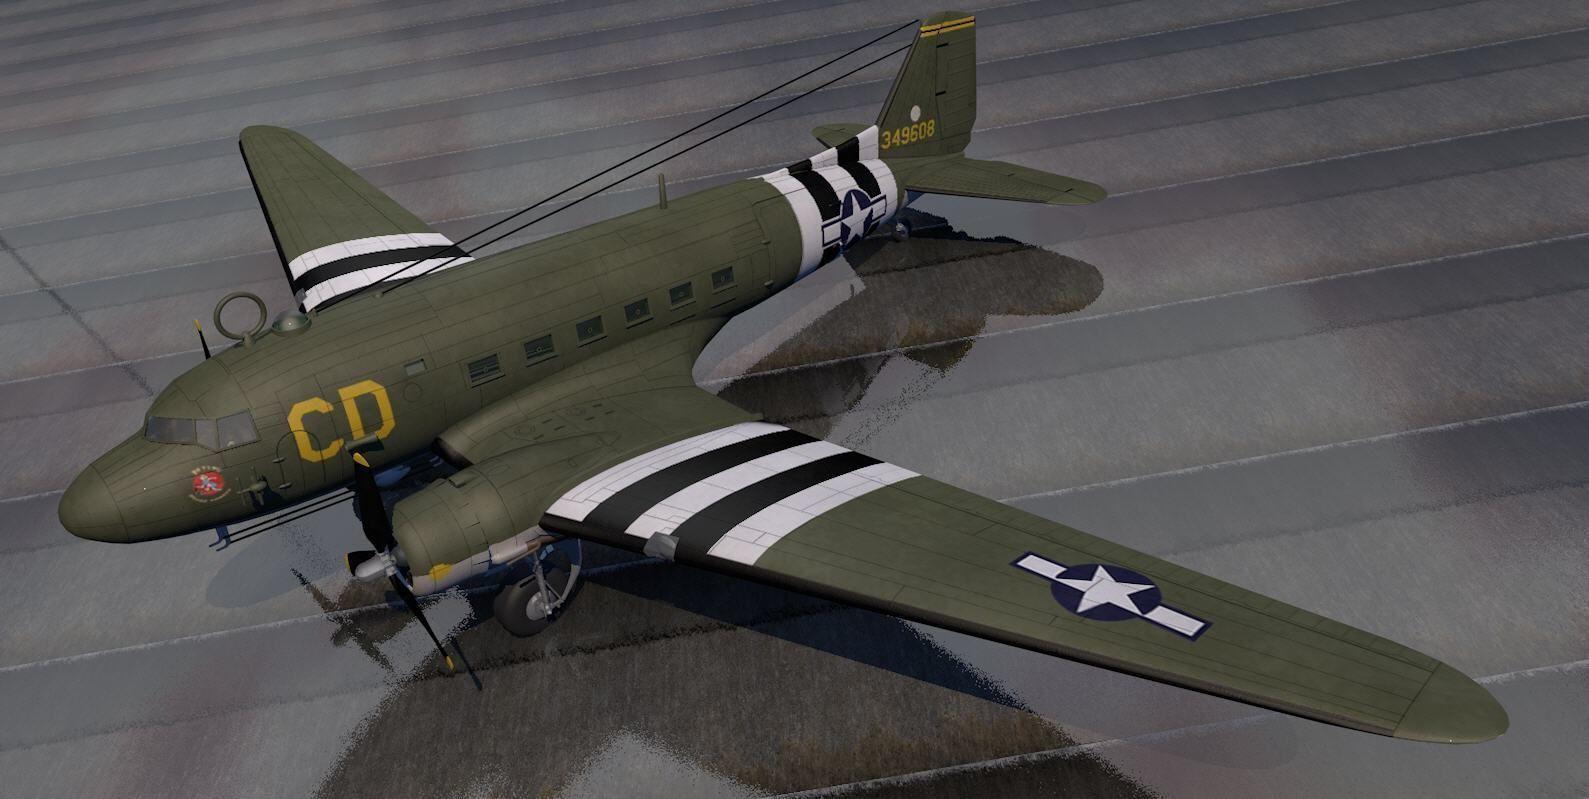 Douglas C-47 Dakota or Skytrain